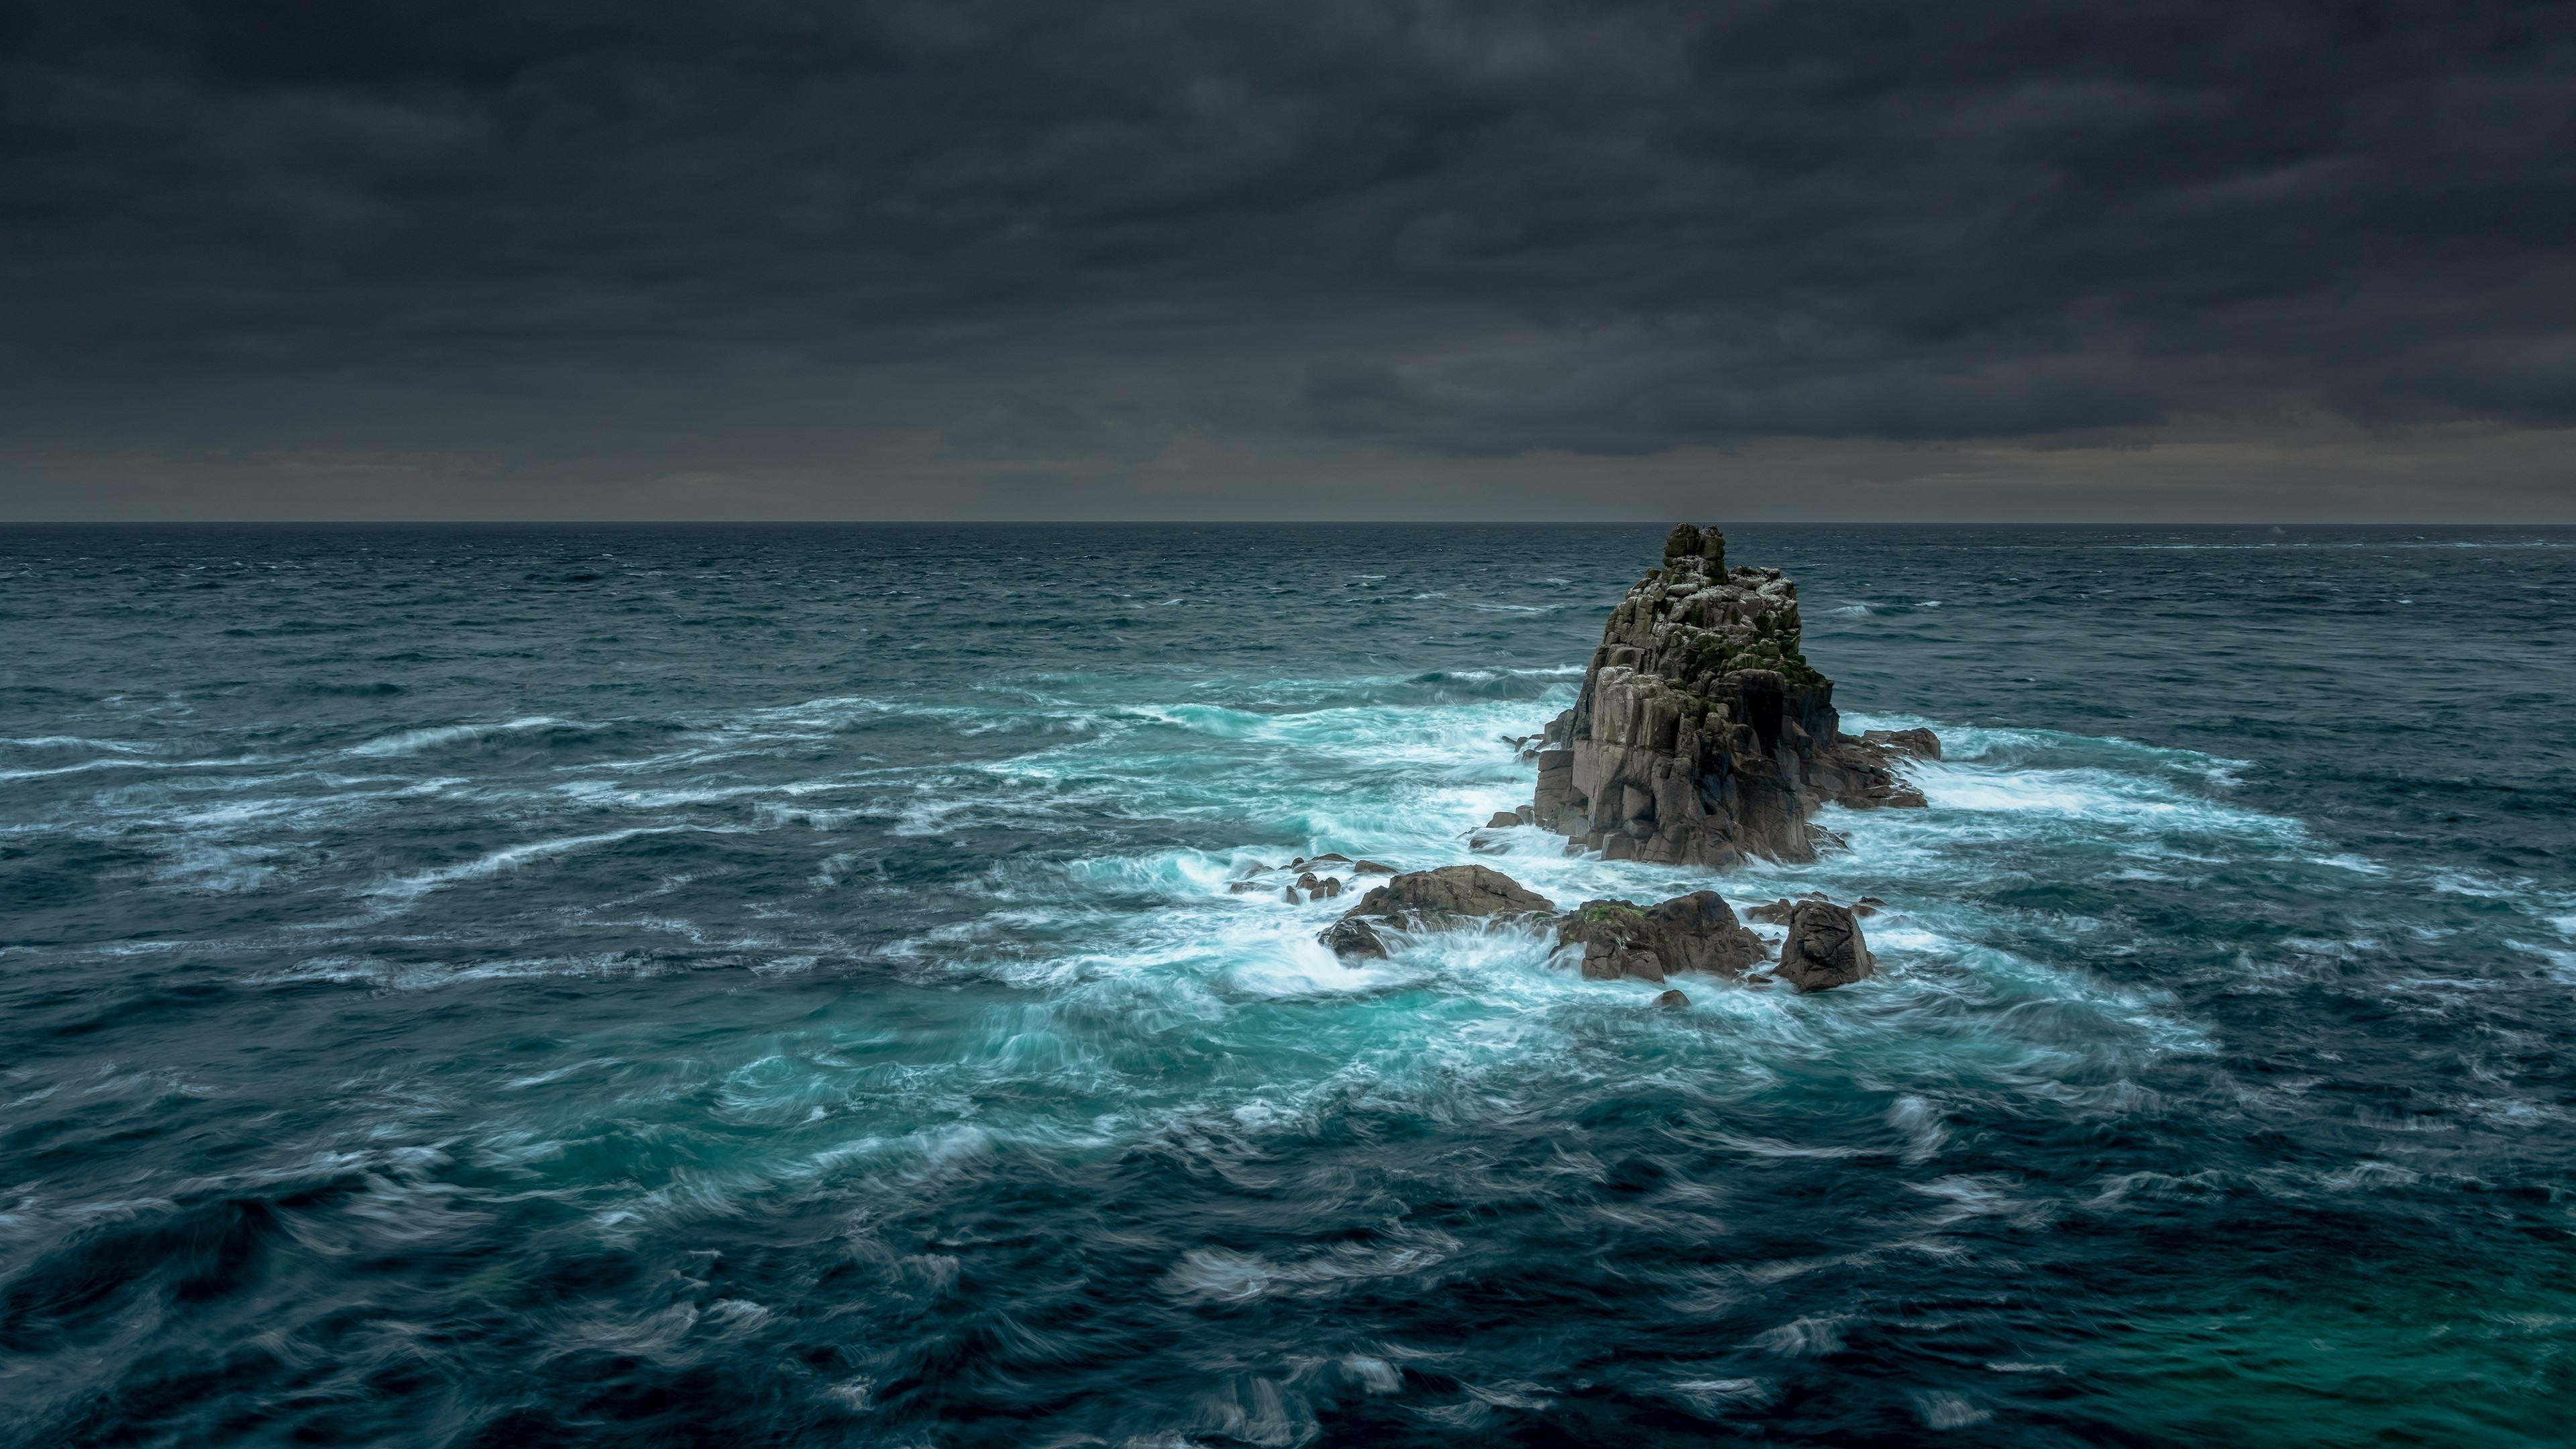 Wallpaper Rocks Sea Storm Clouds 3840x2160 Uhd 4k Picture